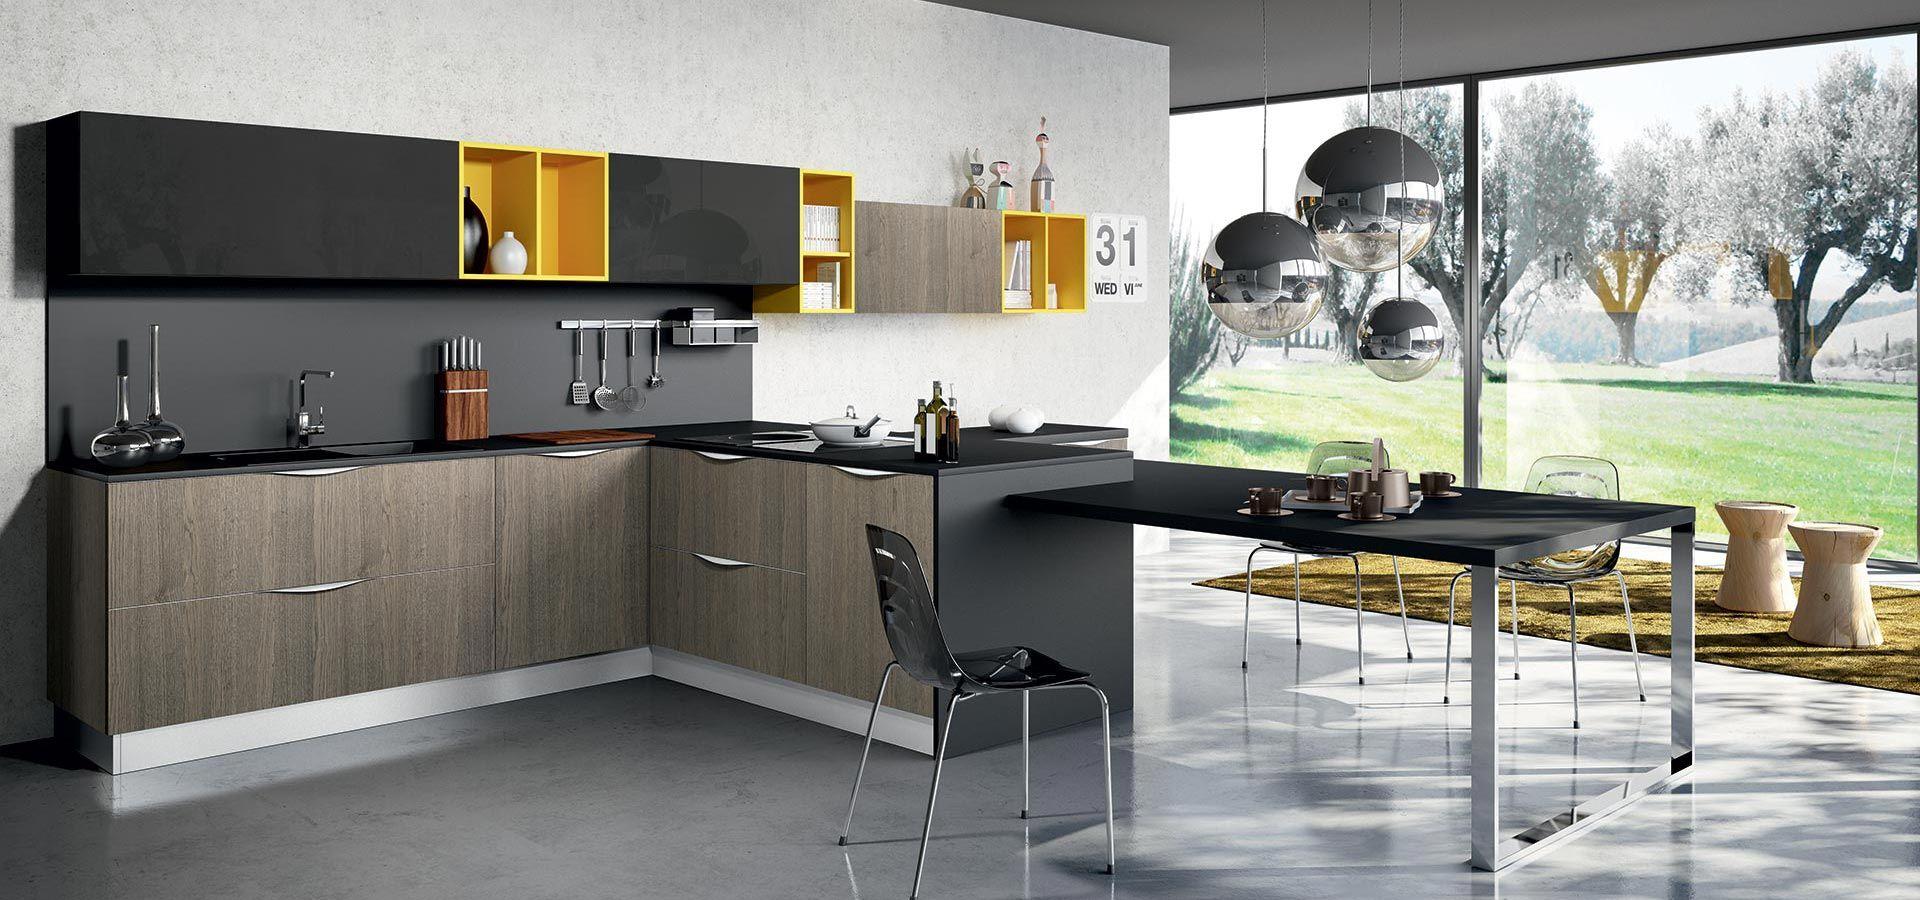 Cucina moderna moon duna diva finitura rovere nodino - Arredo3 cucine moderne ...